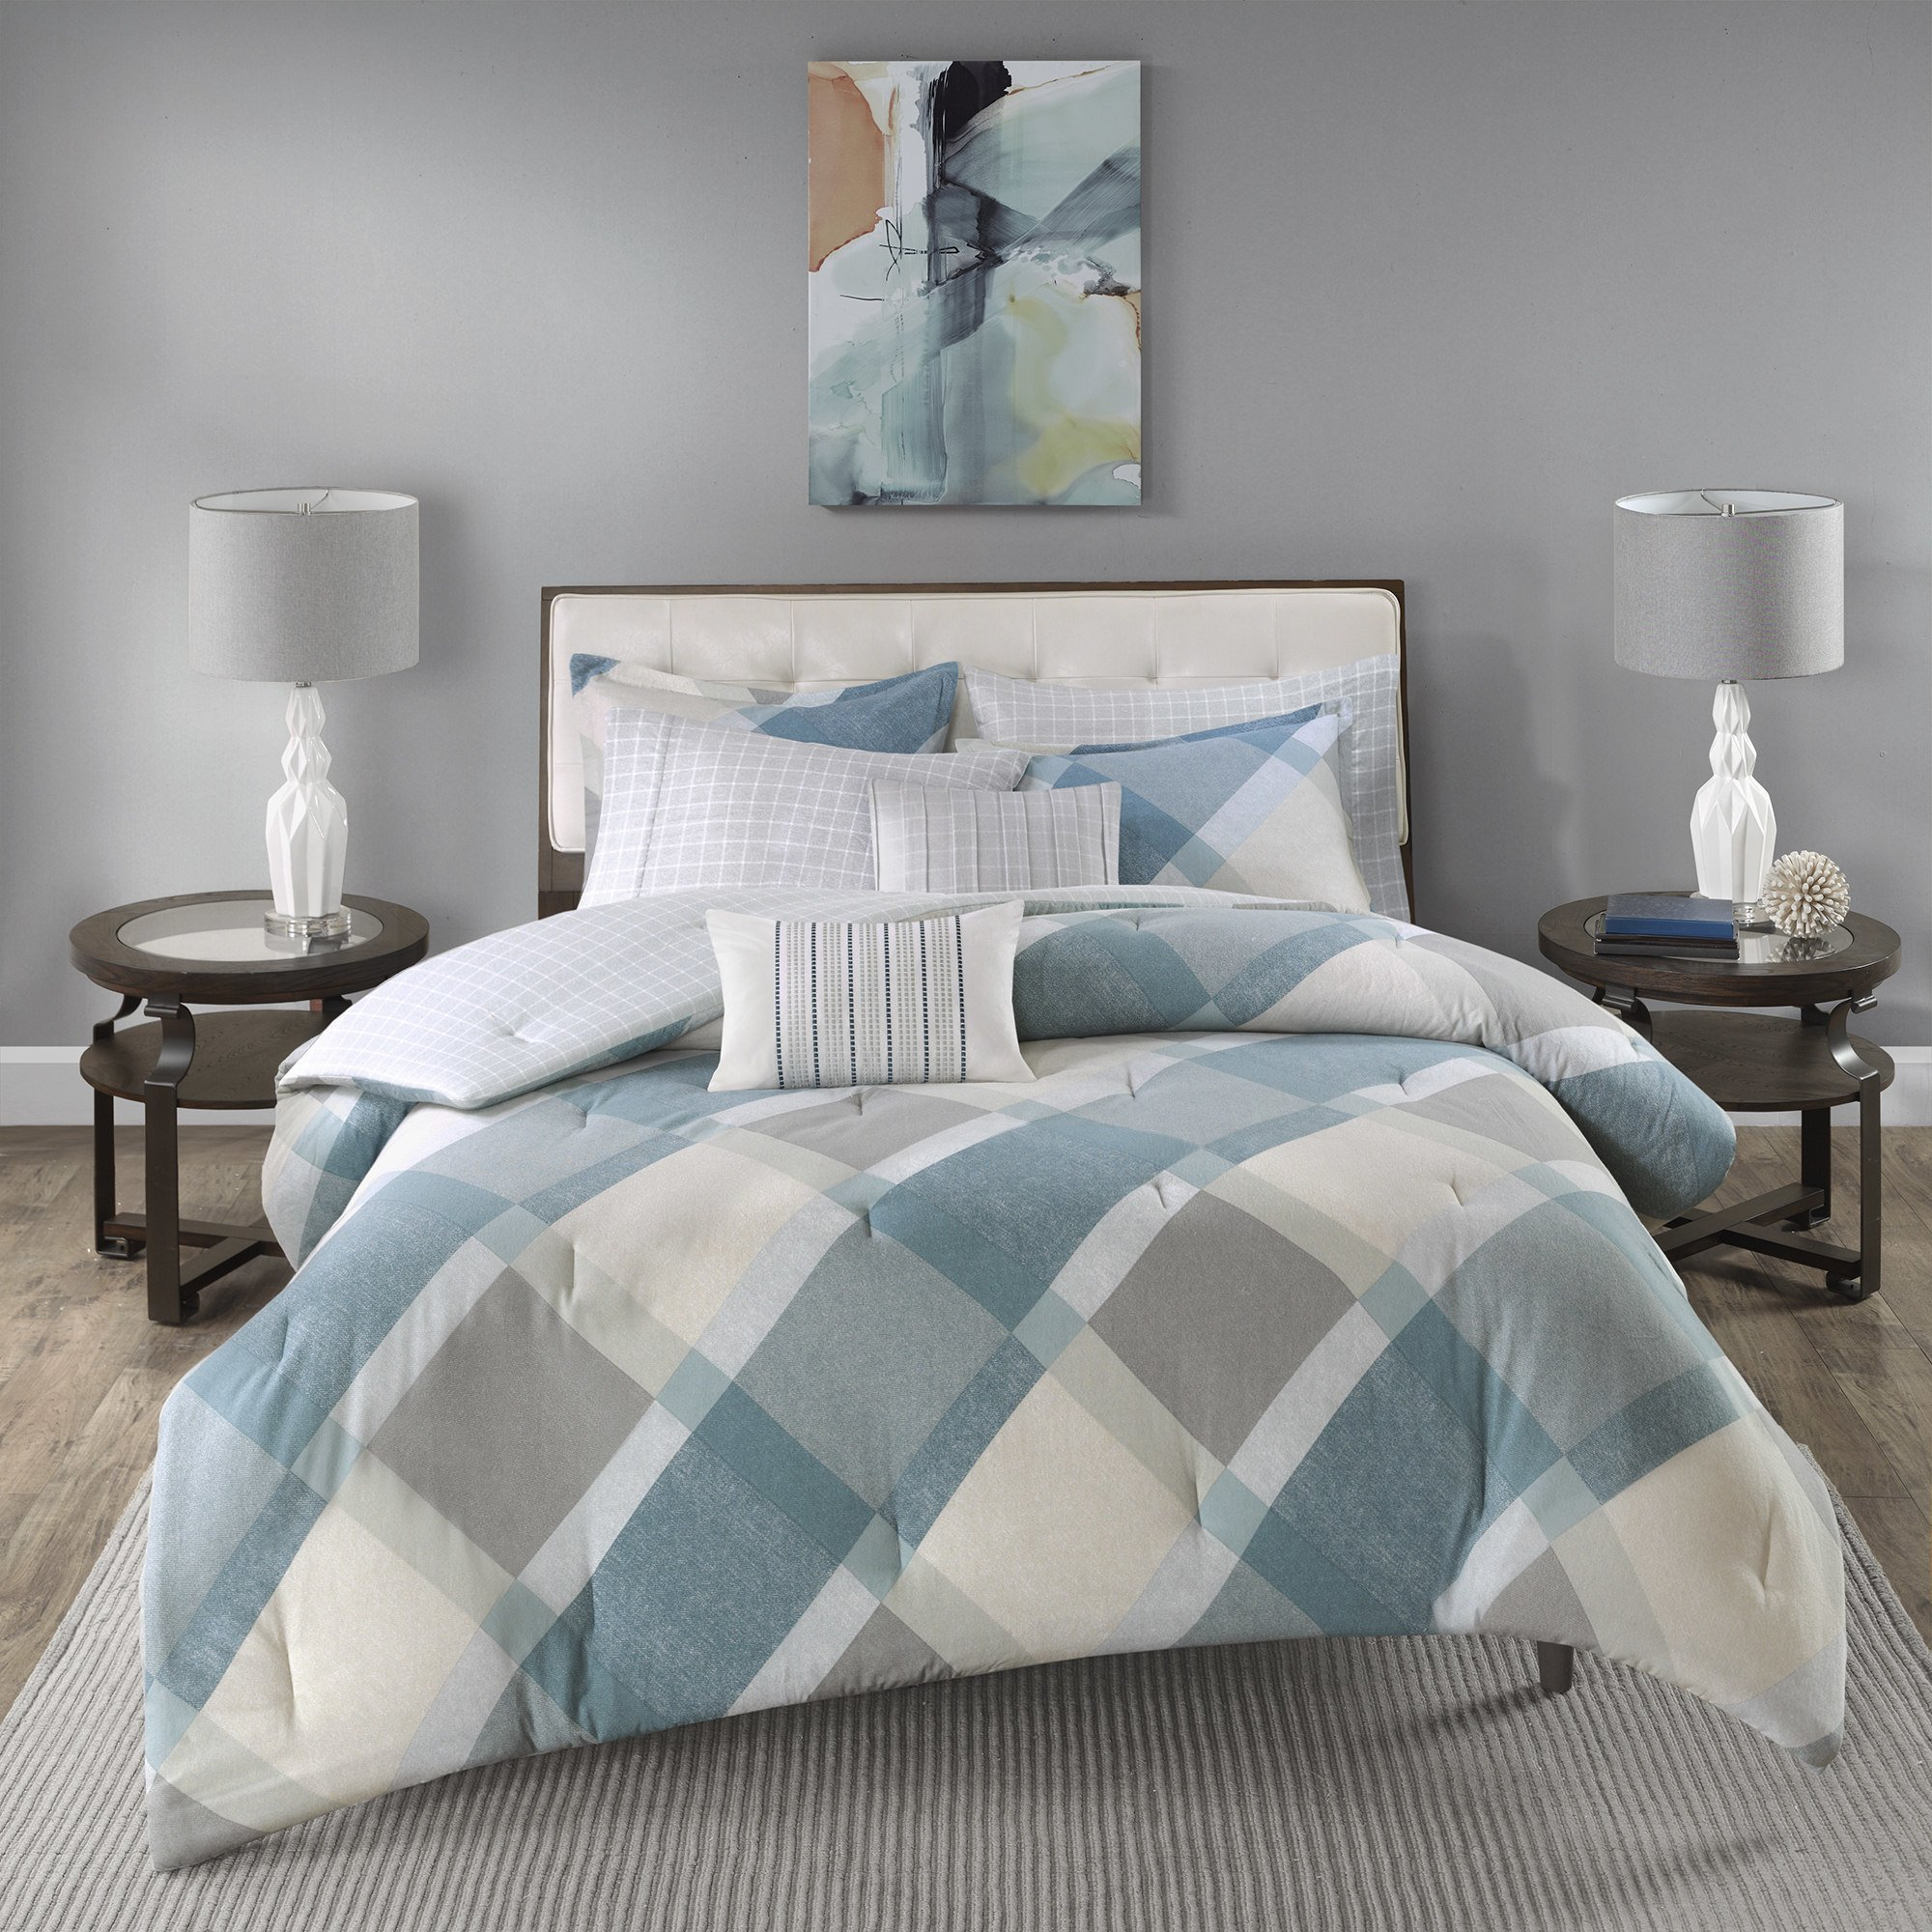 7 Piece Dusty Blue Grey Off White Checkered Diamond Plaid Themed Flannel Duvet Cover King Cal Set, Beautiful Geometric Checker Bedding, Chic Reverse Windowpane Theme Pattern, Cotton